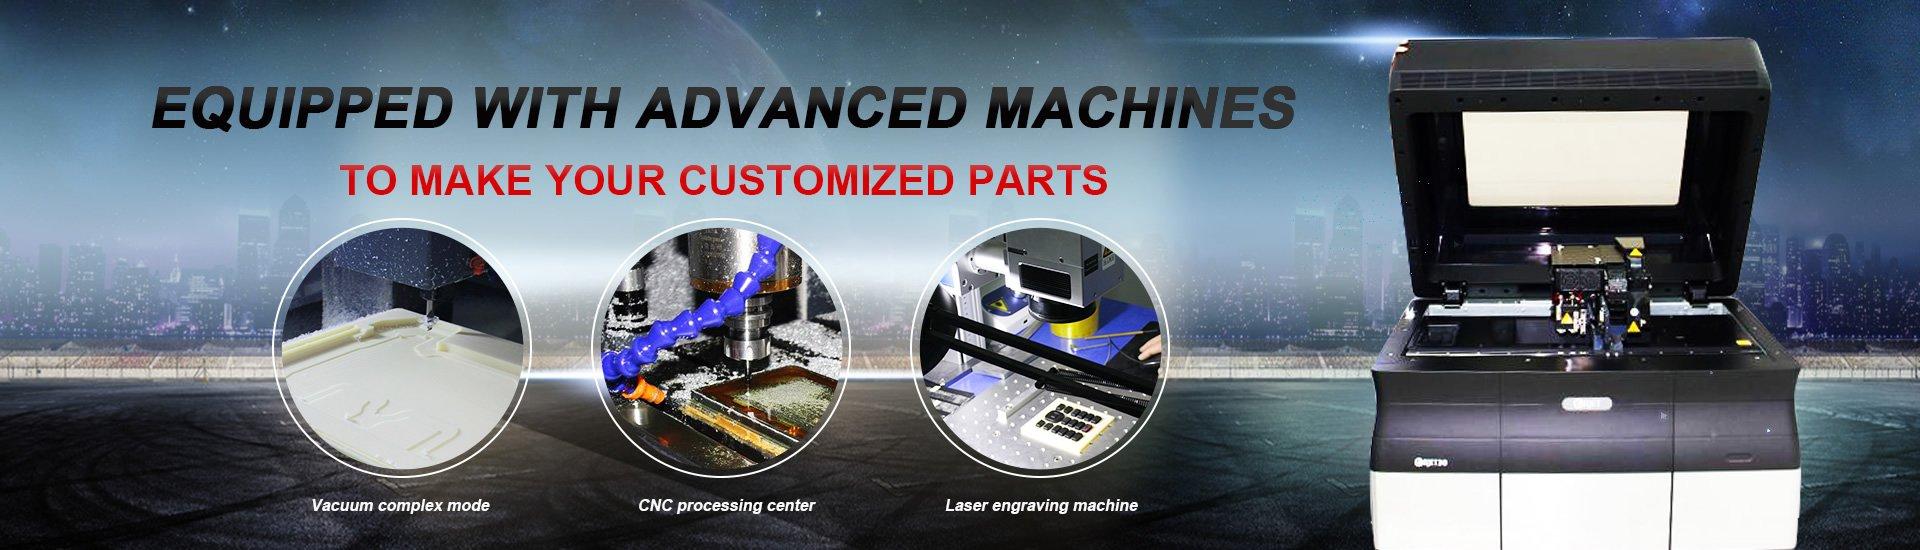 Tuowei High Precision Aluminum Components Parts Aluminum Alloy Prototype image4